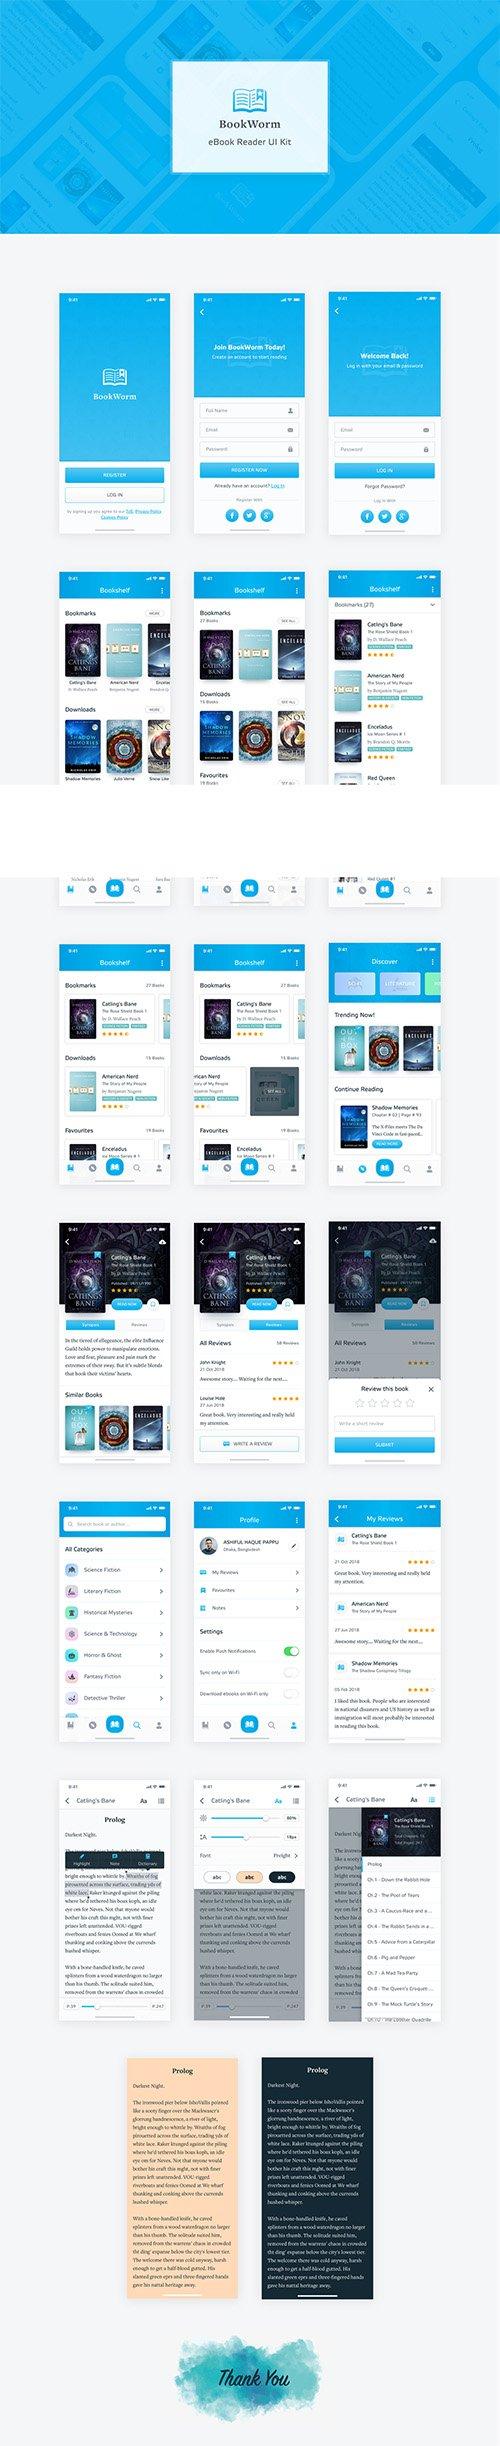 BookWorm eBook Reader UI Kit » NitroGFX - Download Unique Graphics